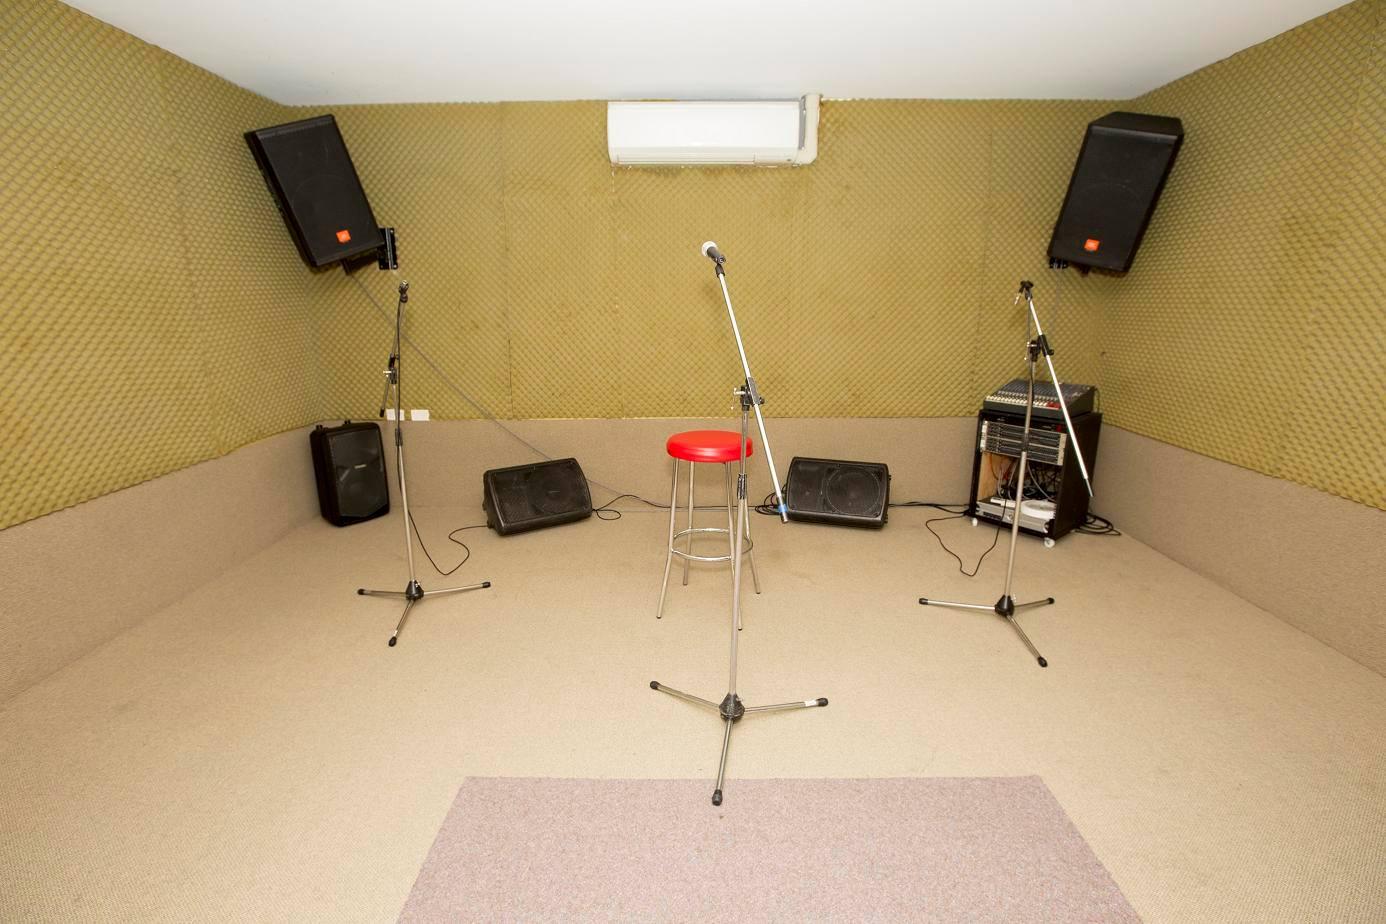 reheasal6.jpg